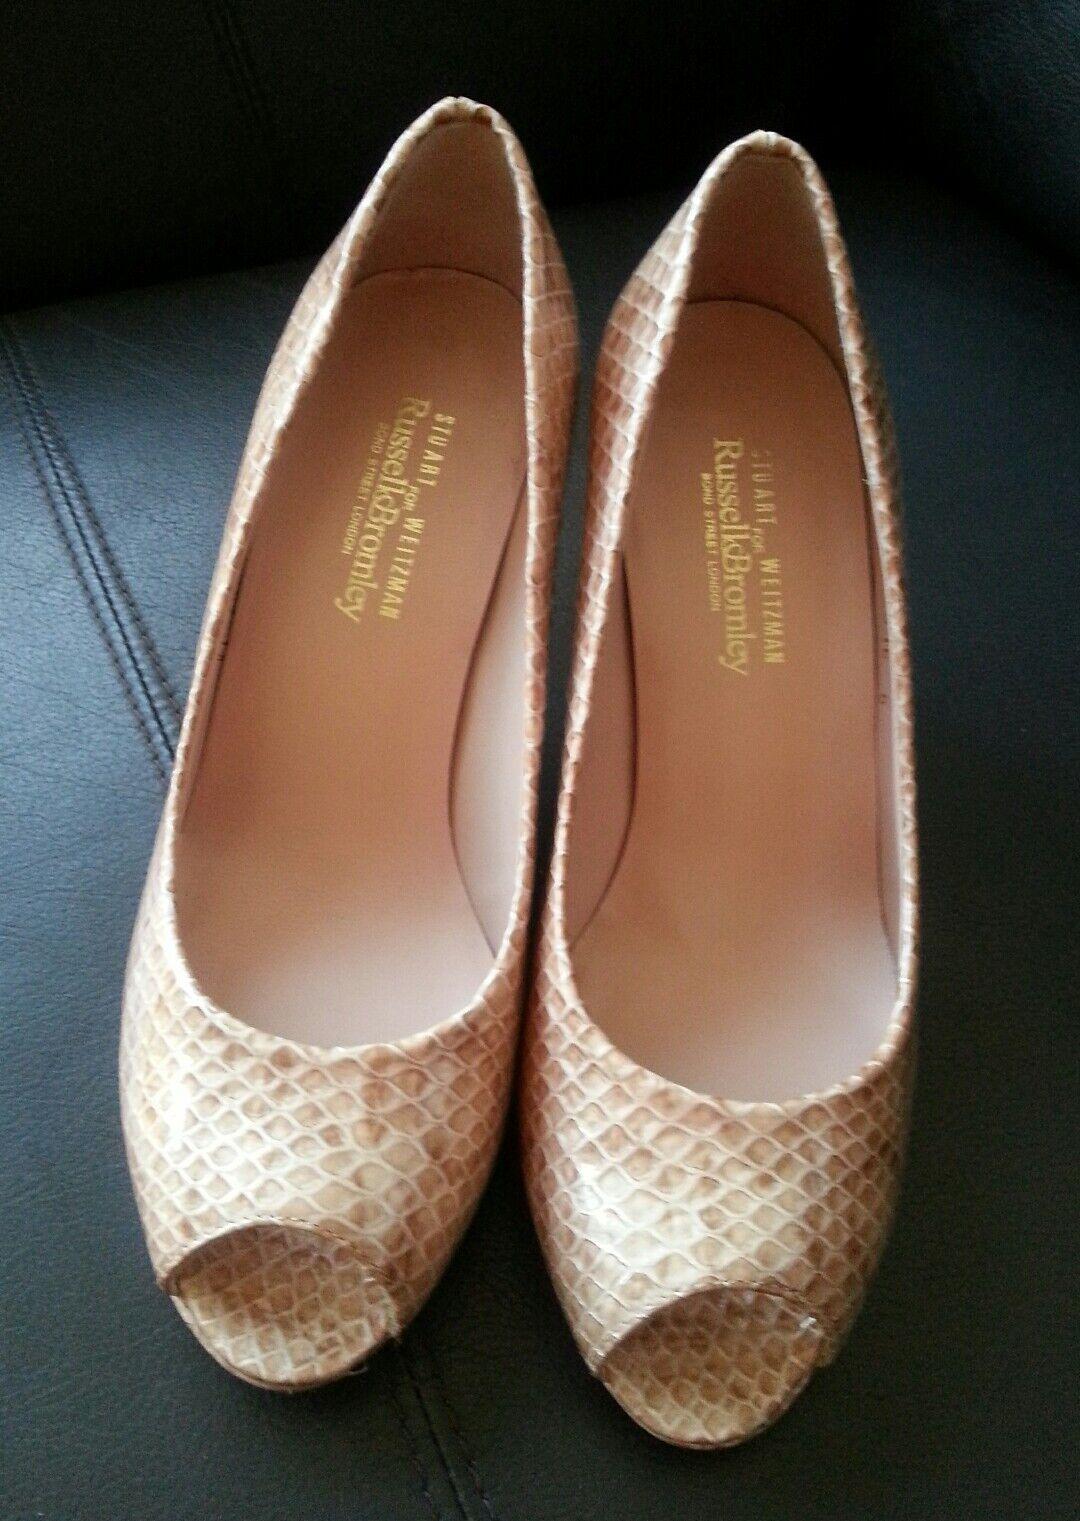 sconto di vendita Russell & Bromley STUART WEITZMAN WEITZMAN WEITZMAN con tacco Misura Scarpe Pelle di Serpente naturale  vendita online